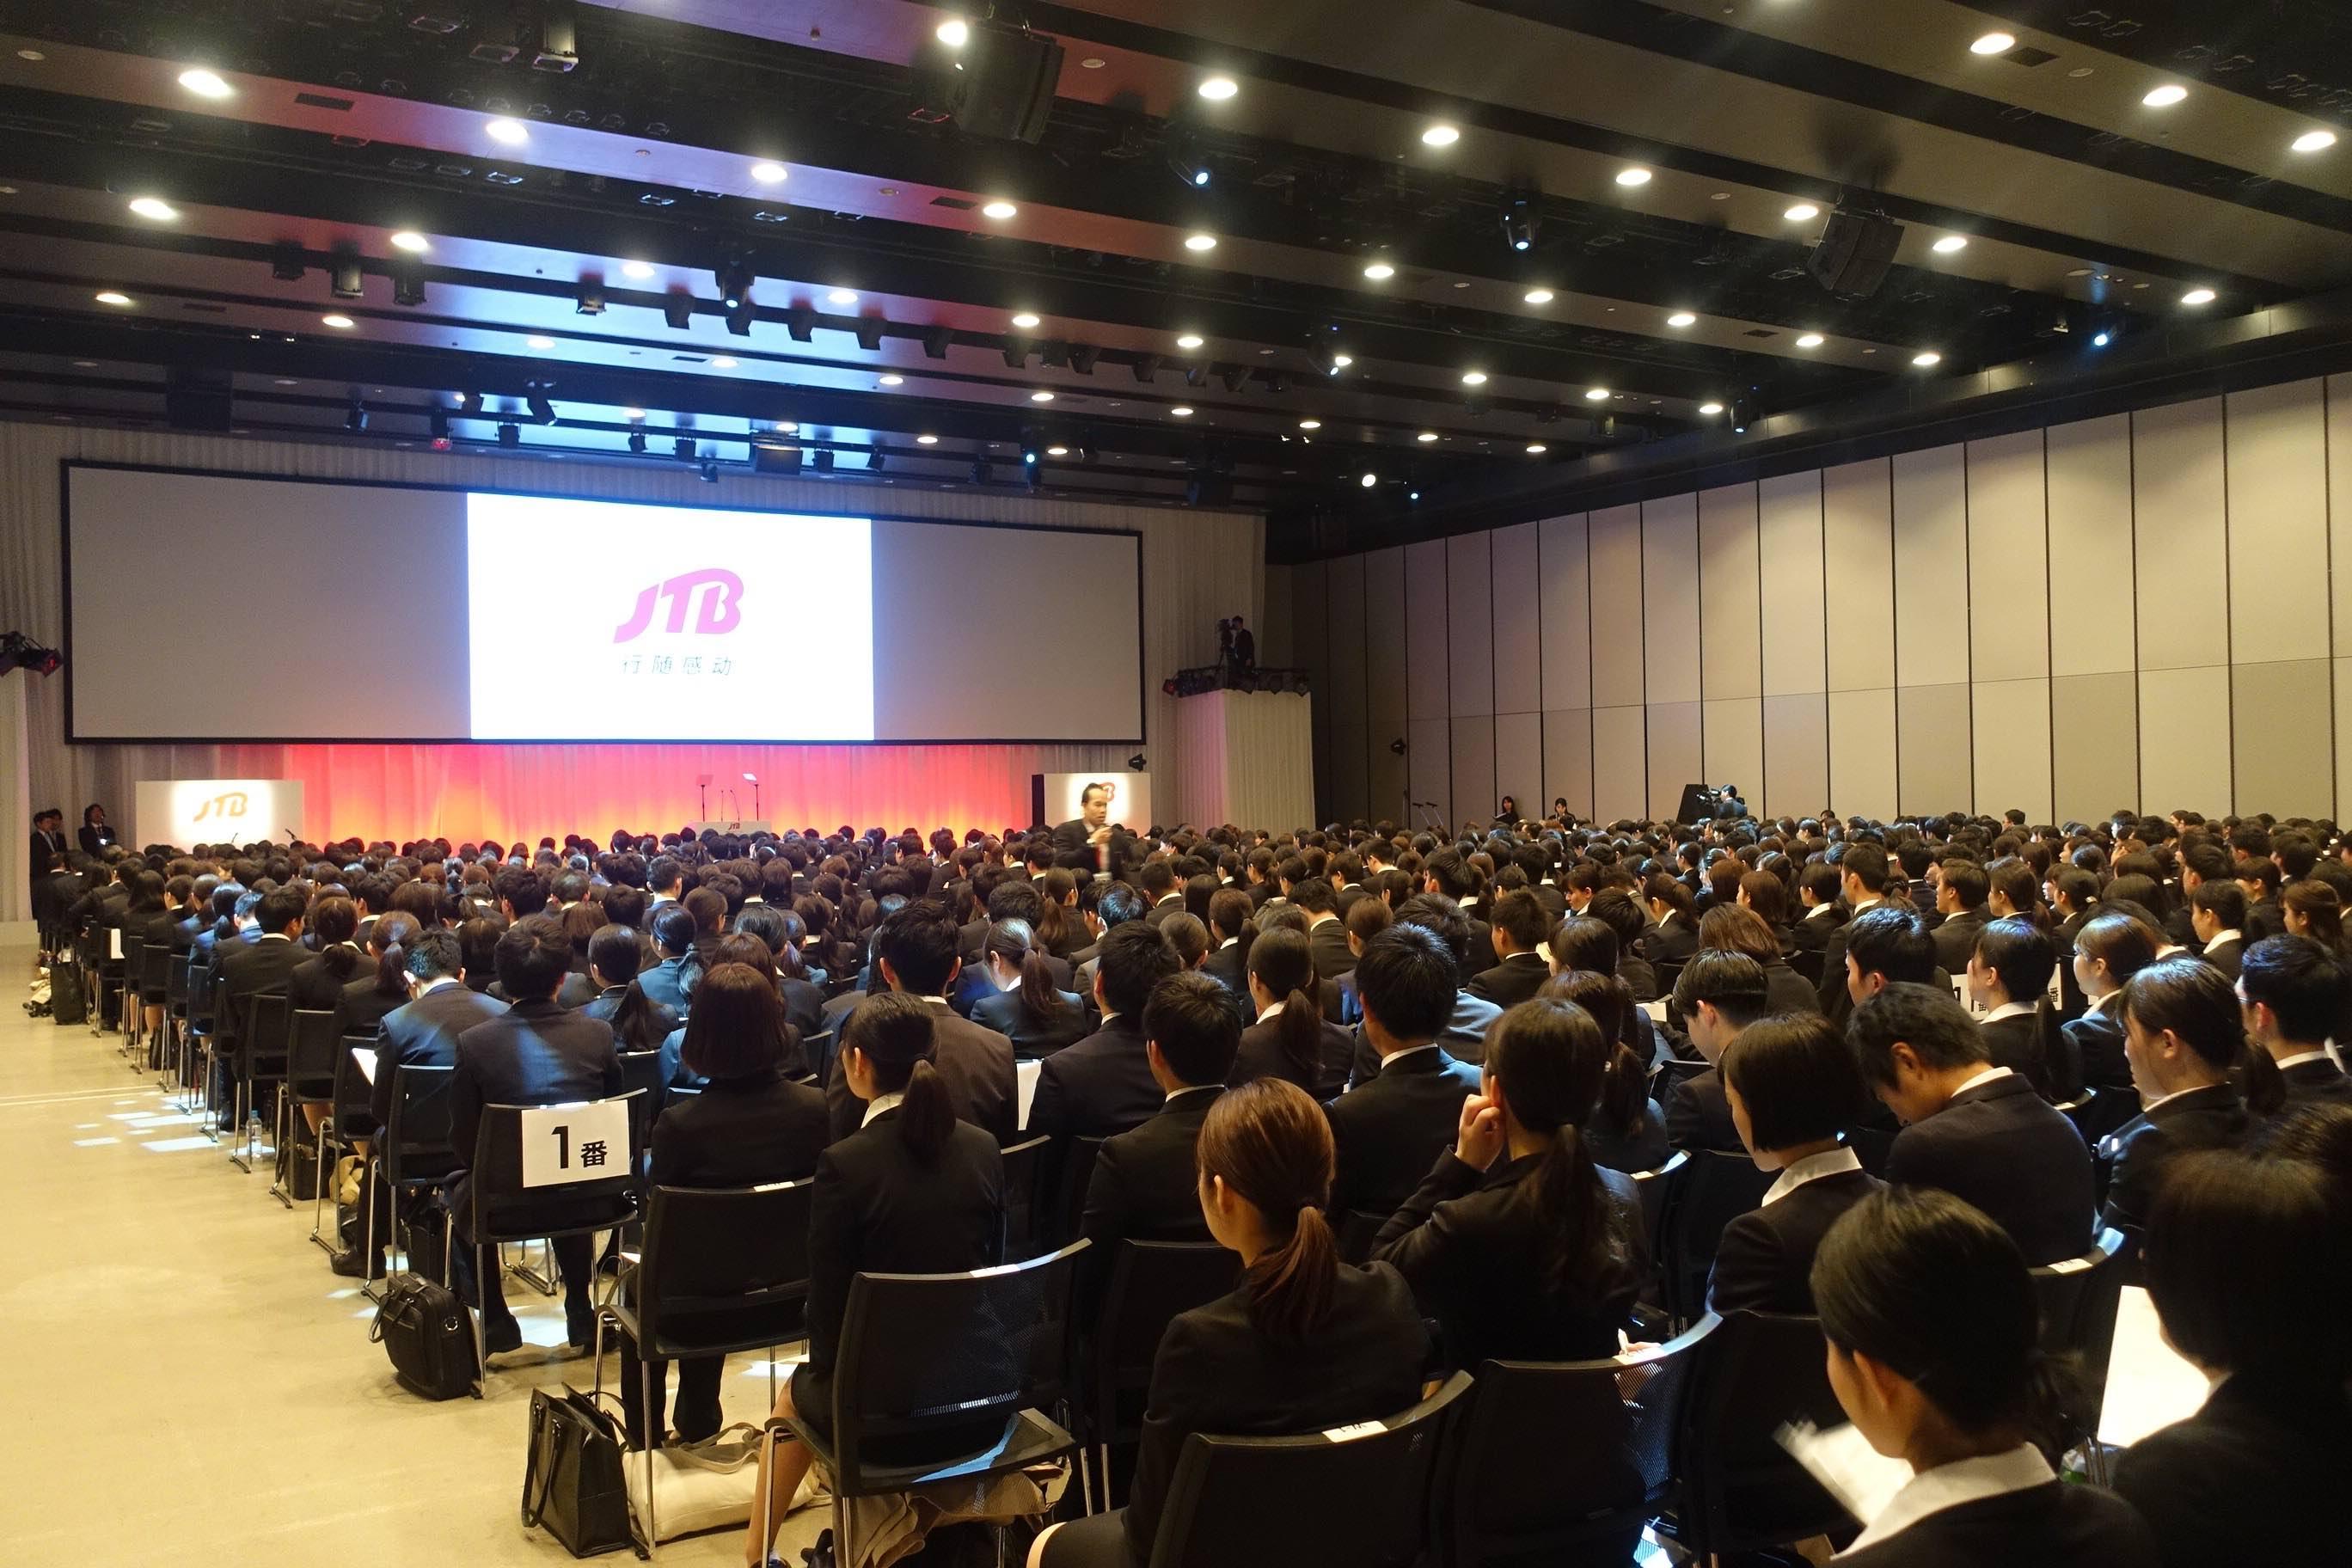 JTB、新体制下で入社式、高橋社長「成果に応えるソリューション企業に」、働き方改革にも意欲【画像】